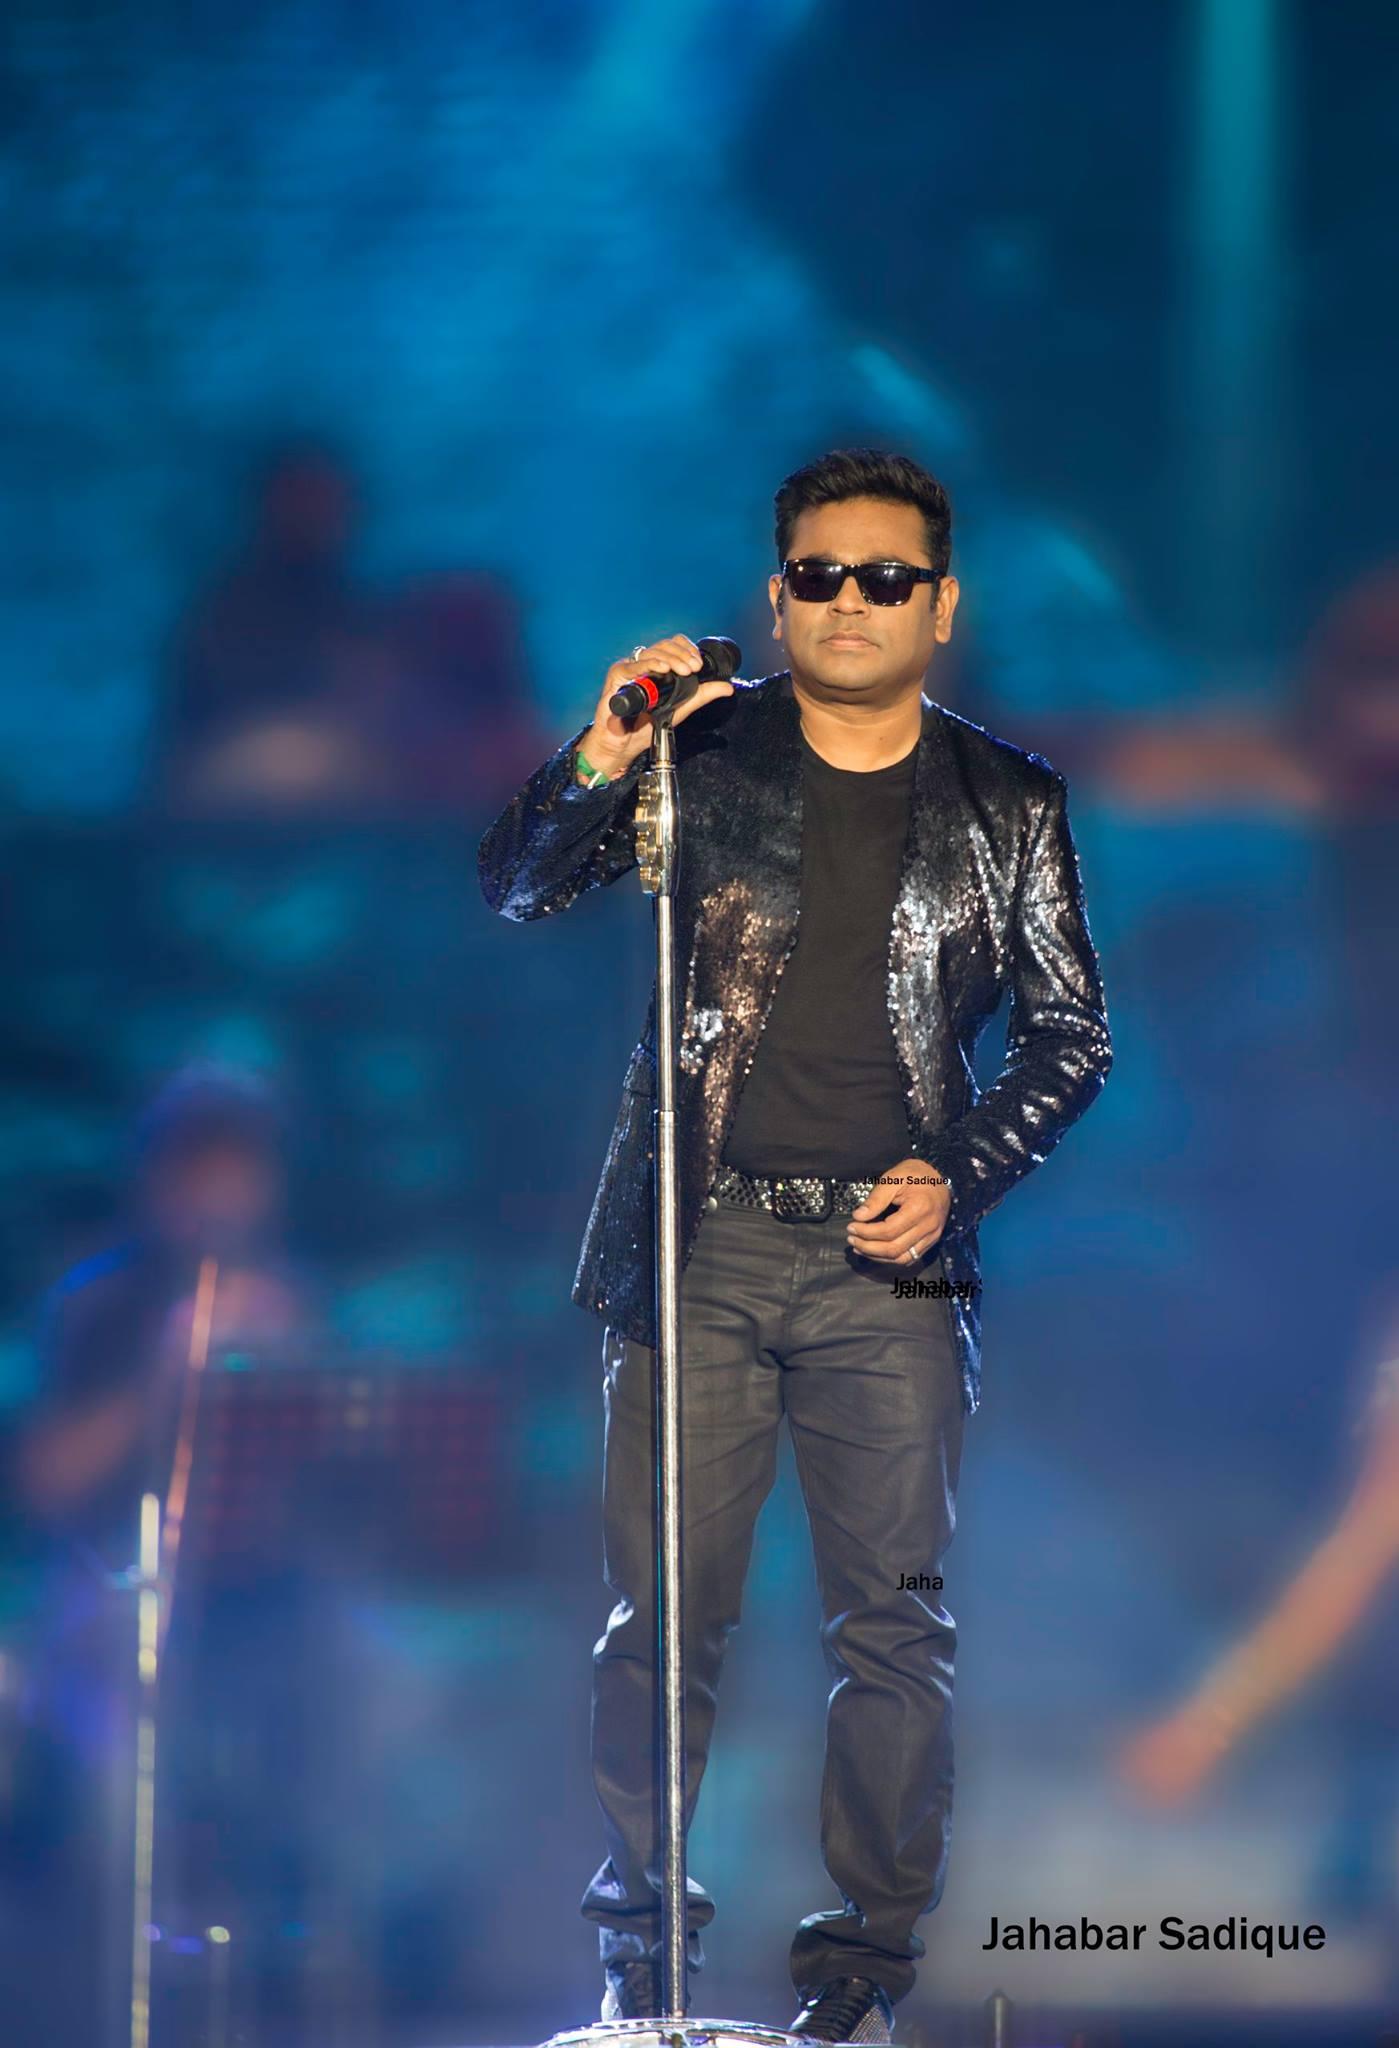 A  R  Rahman discography - Wikipedia